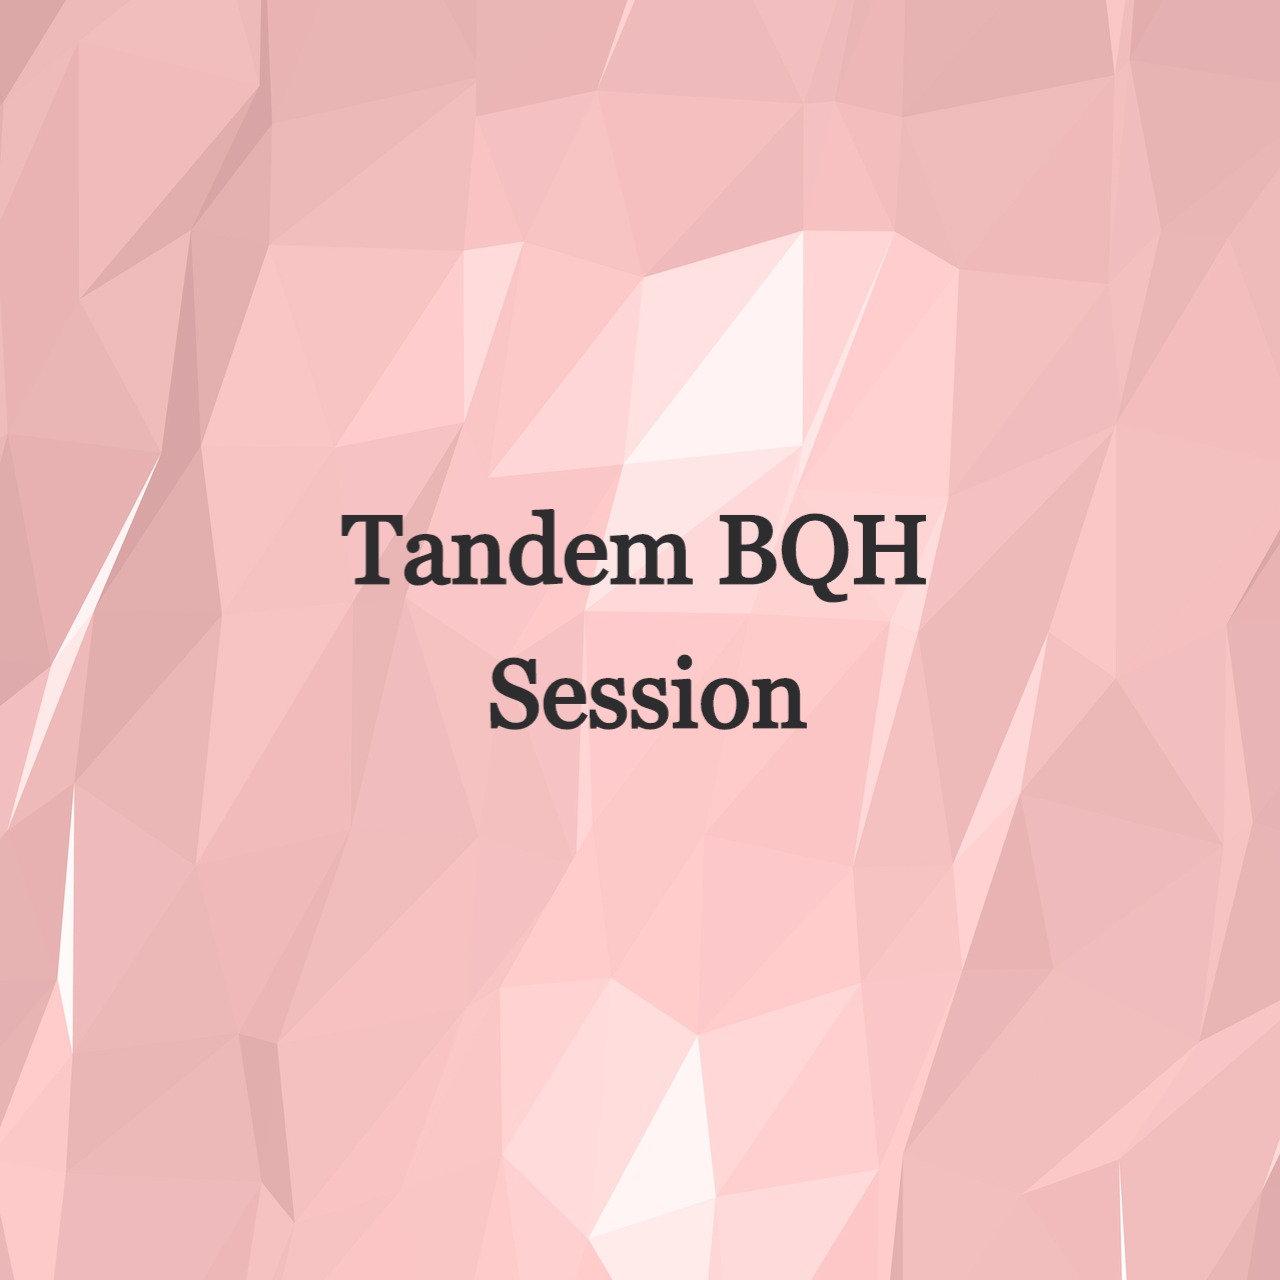 Tandem BQH Session